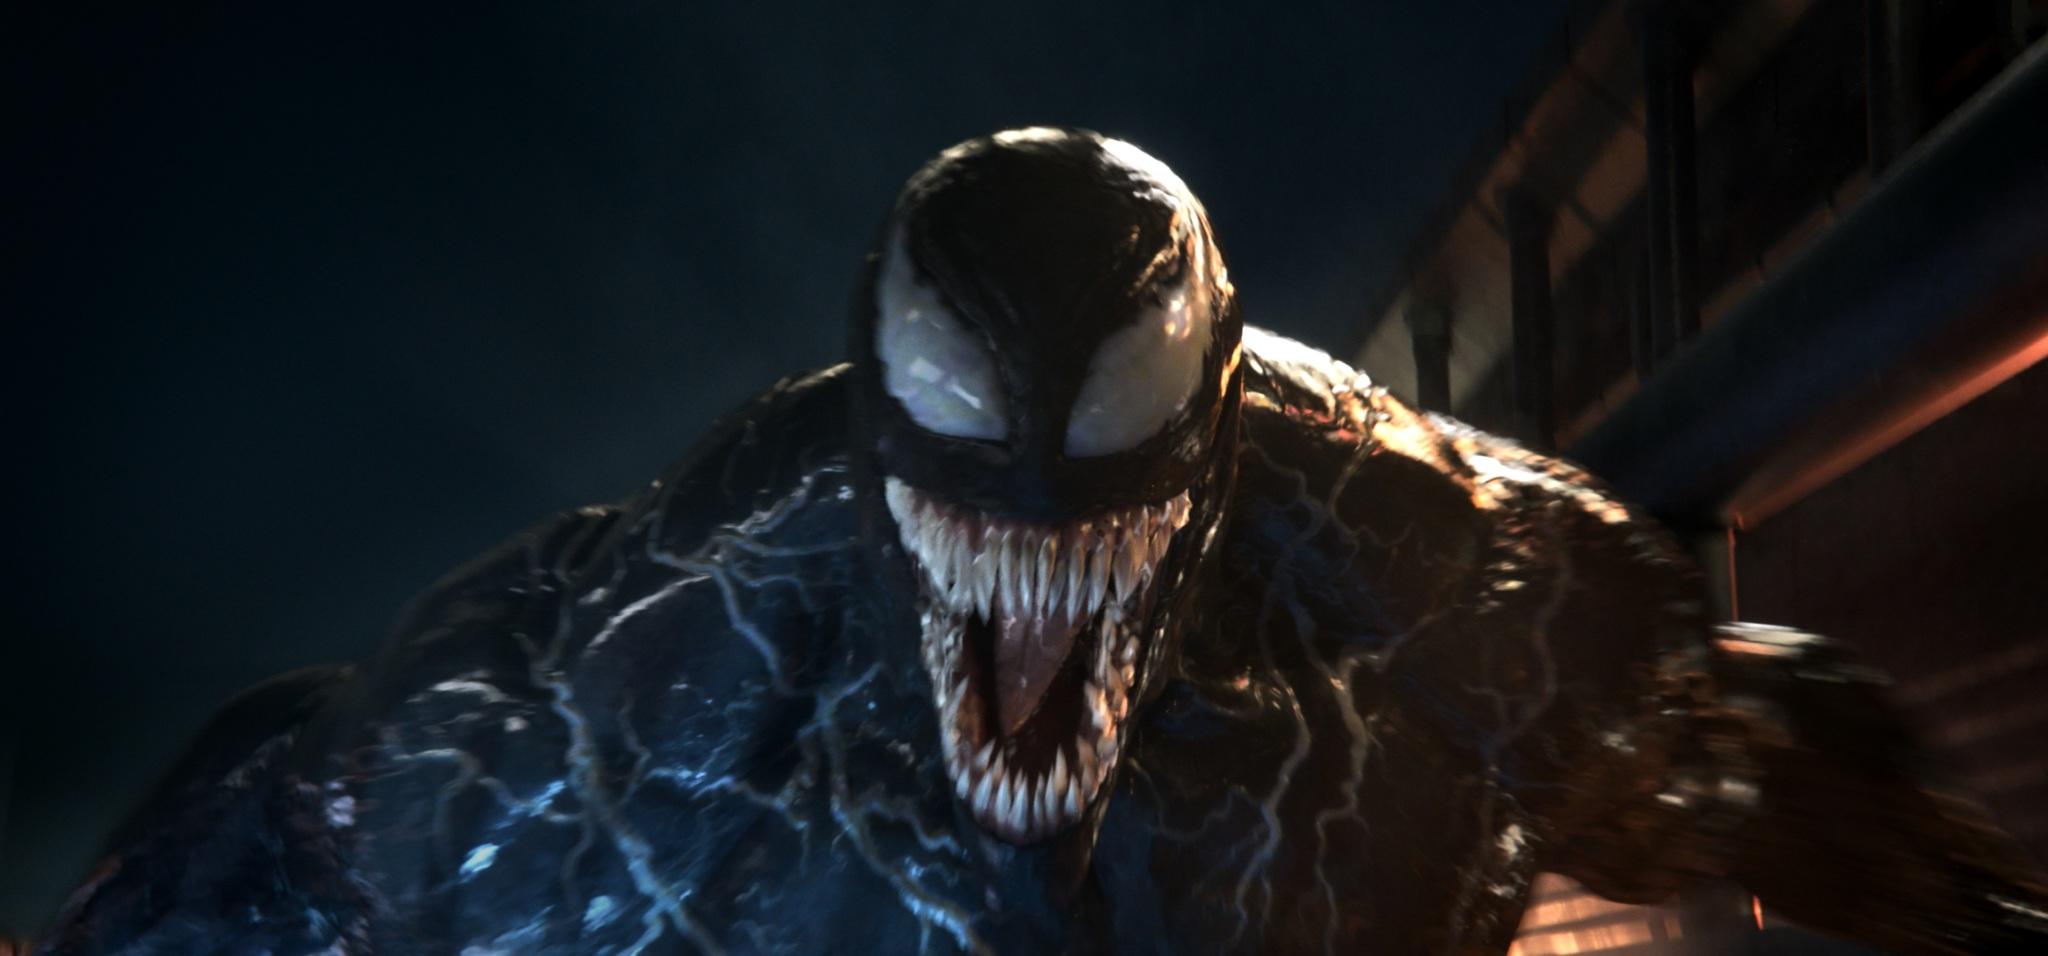 Venom Black Wallpaper Hd For Mobile